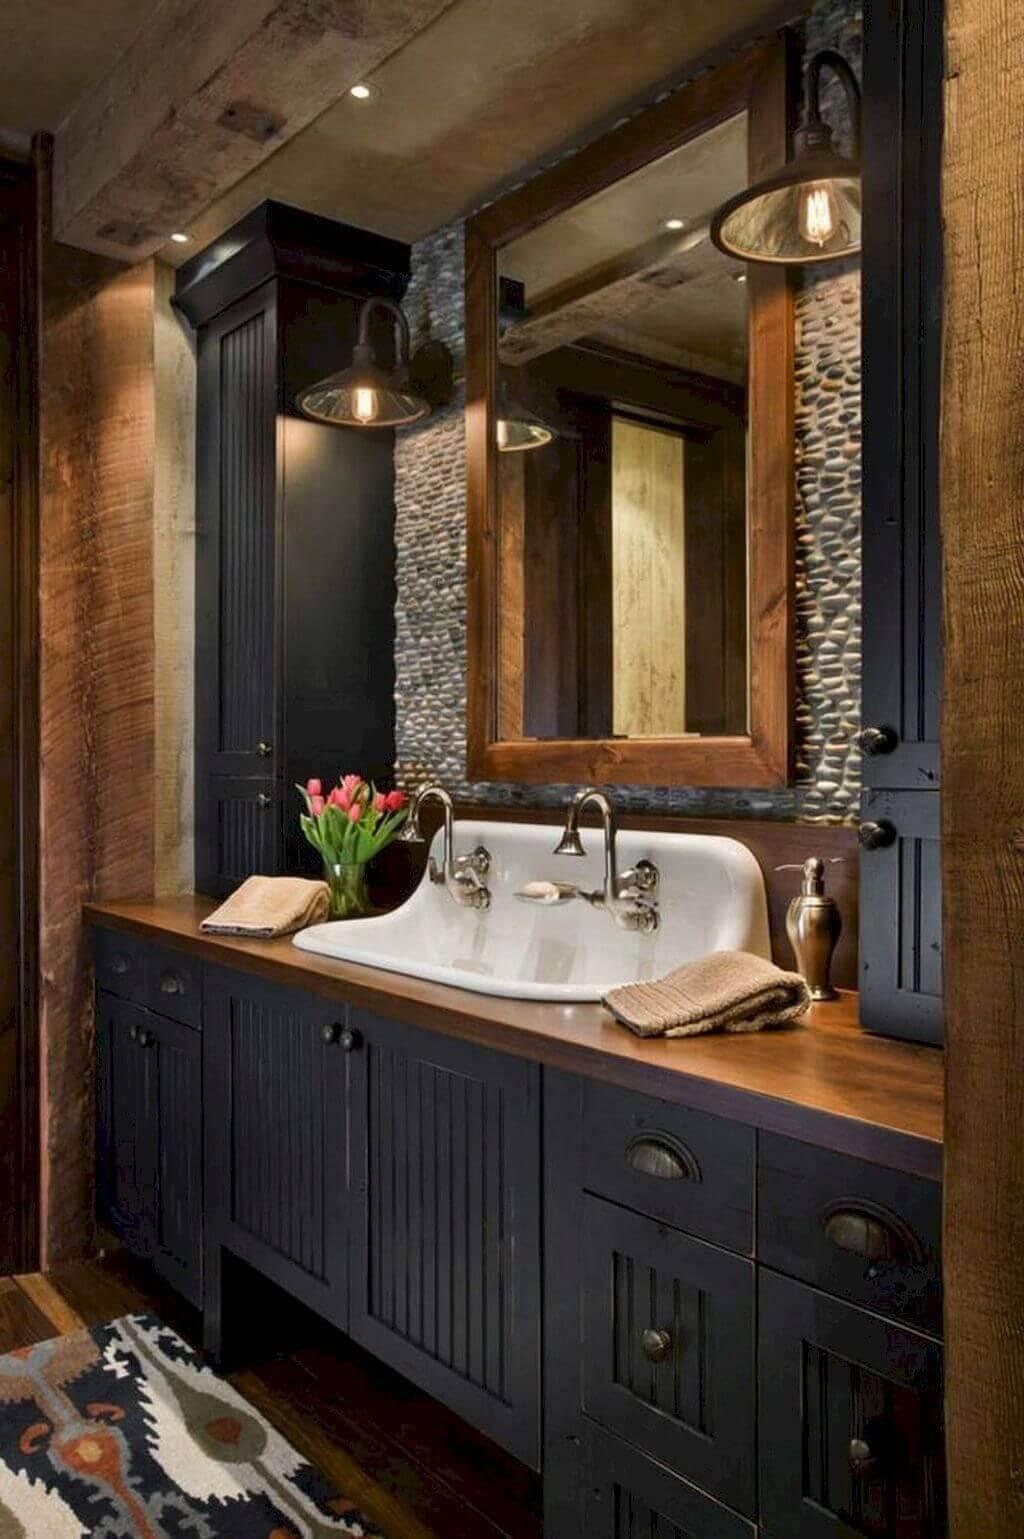 25 Stunning Shabby Chic Bathroom Designs That Will Adore You - 9A6A1Db52Fddda8C945E69D60Eb81F1B